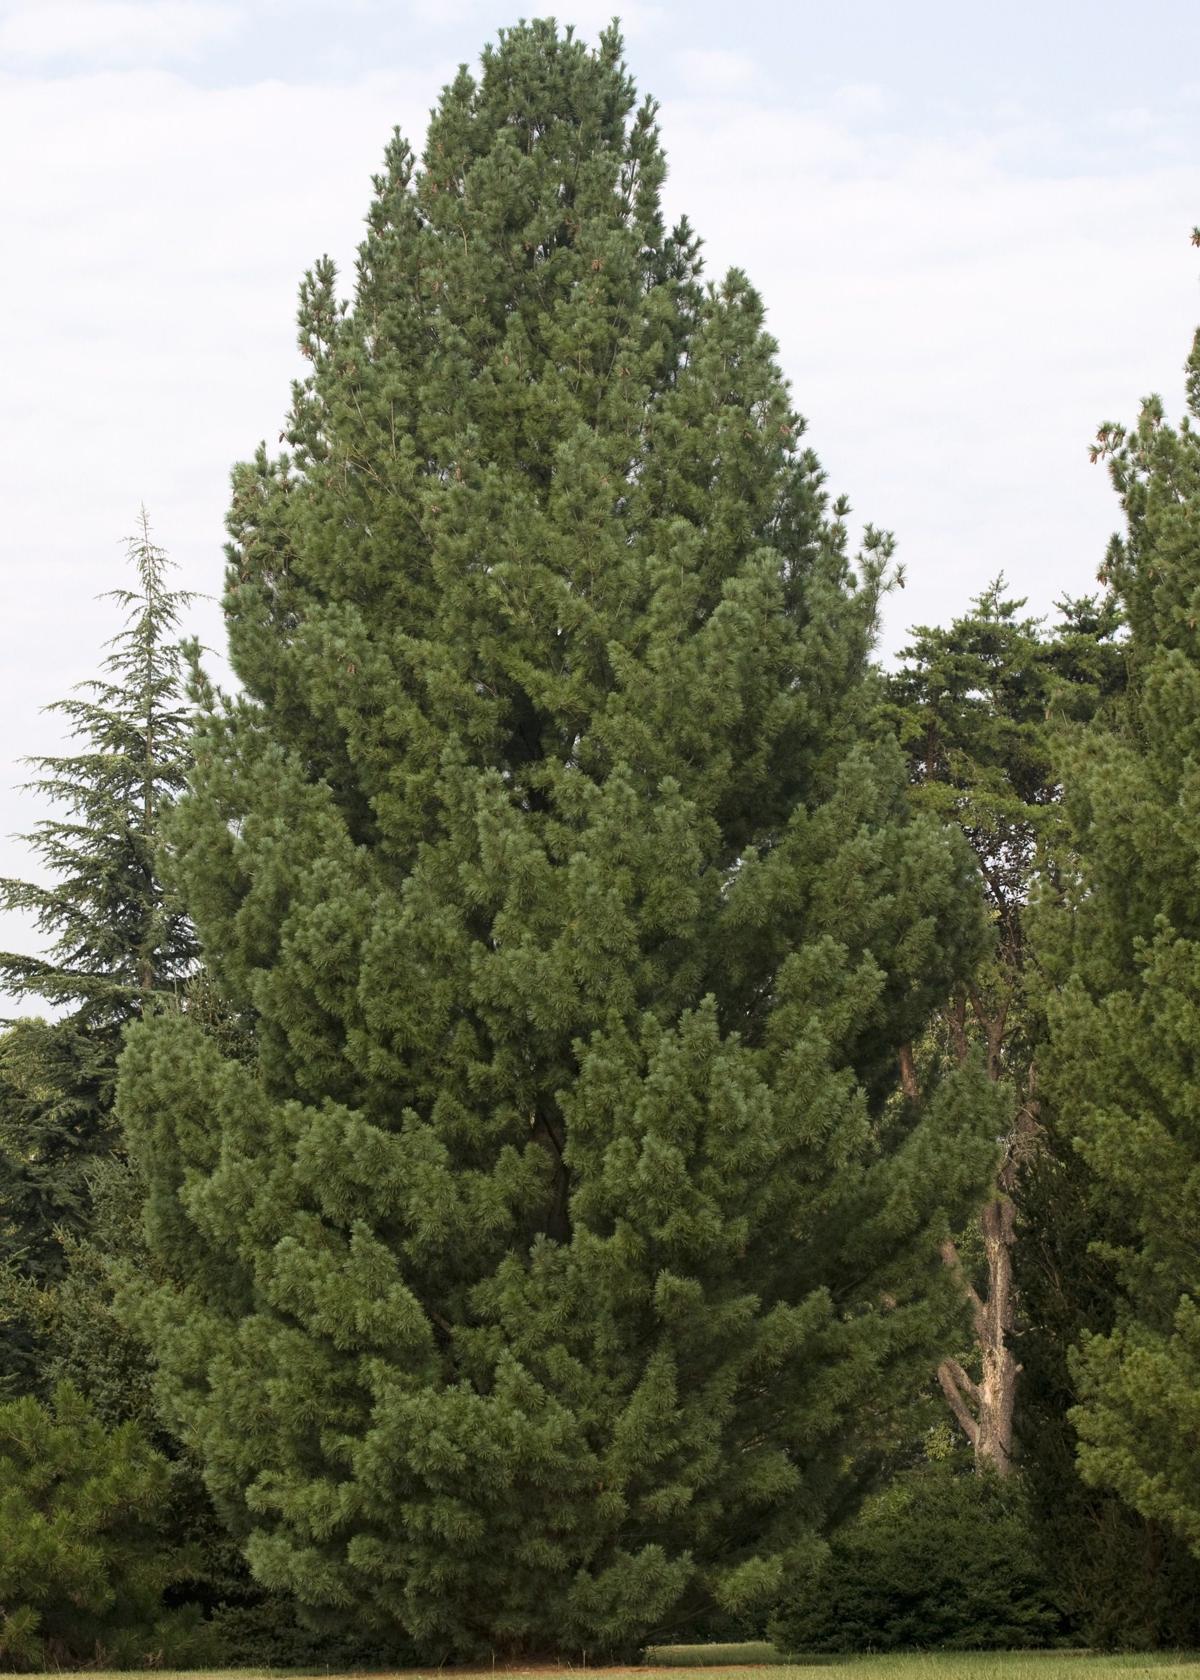 How Fast Do Pine Trees Grow?